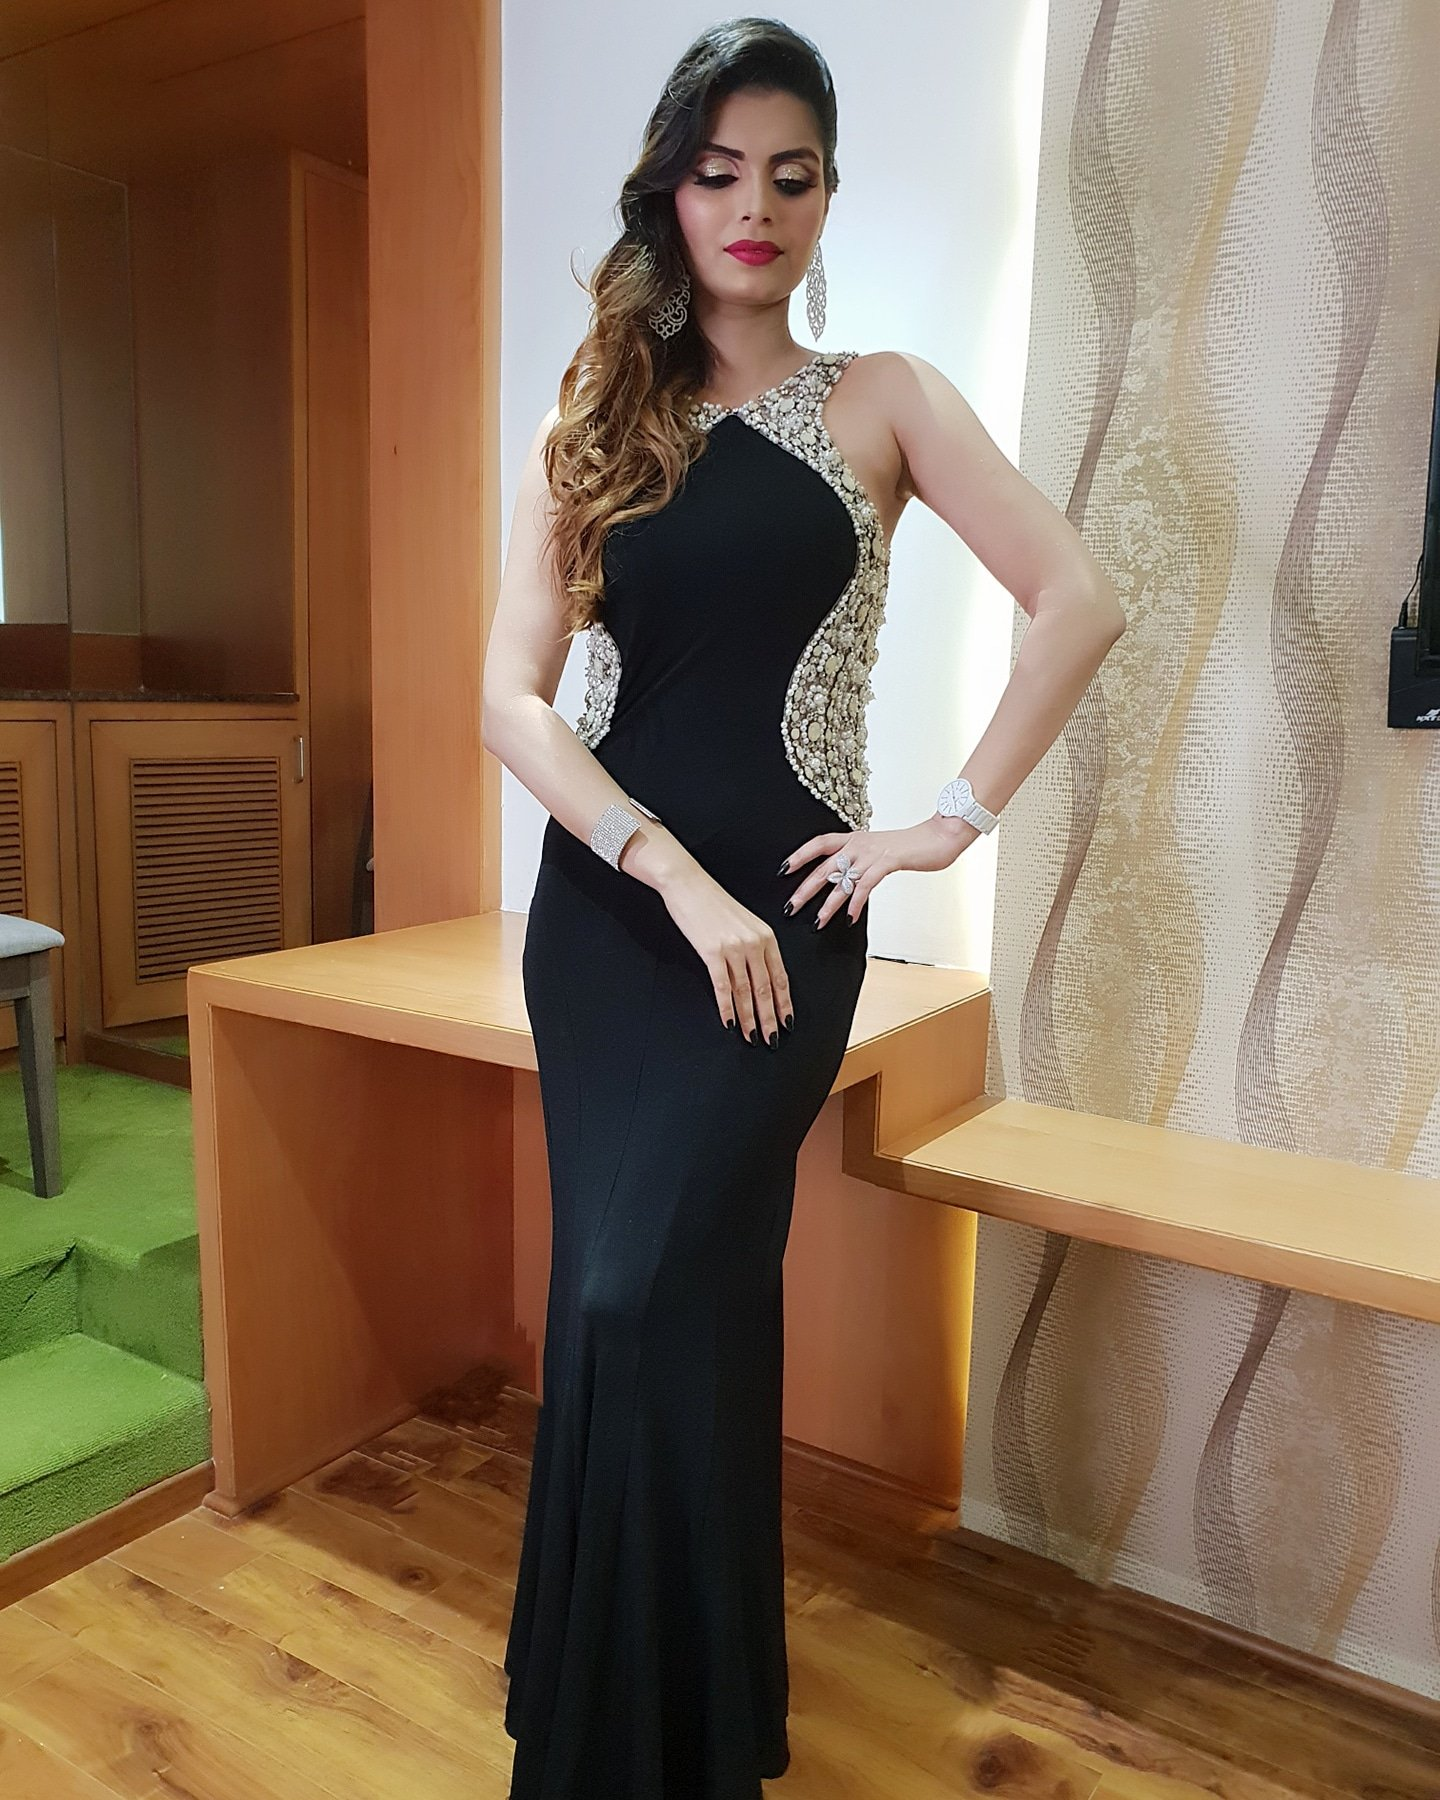 Lastnight #gulbargadiaries  Dress @lizaa_malik #event #fun #weekend #hosting #Army #greatevening #blackandwhite #glamorous #karnataka https://t.co/hsoD6MwczS